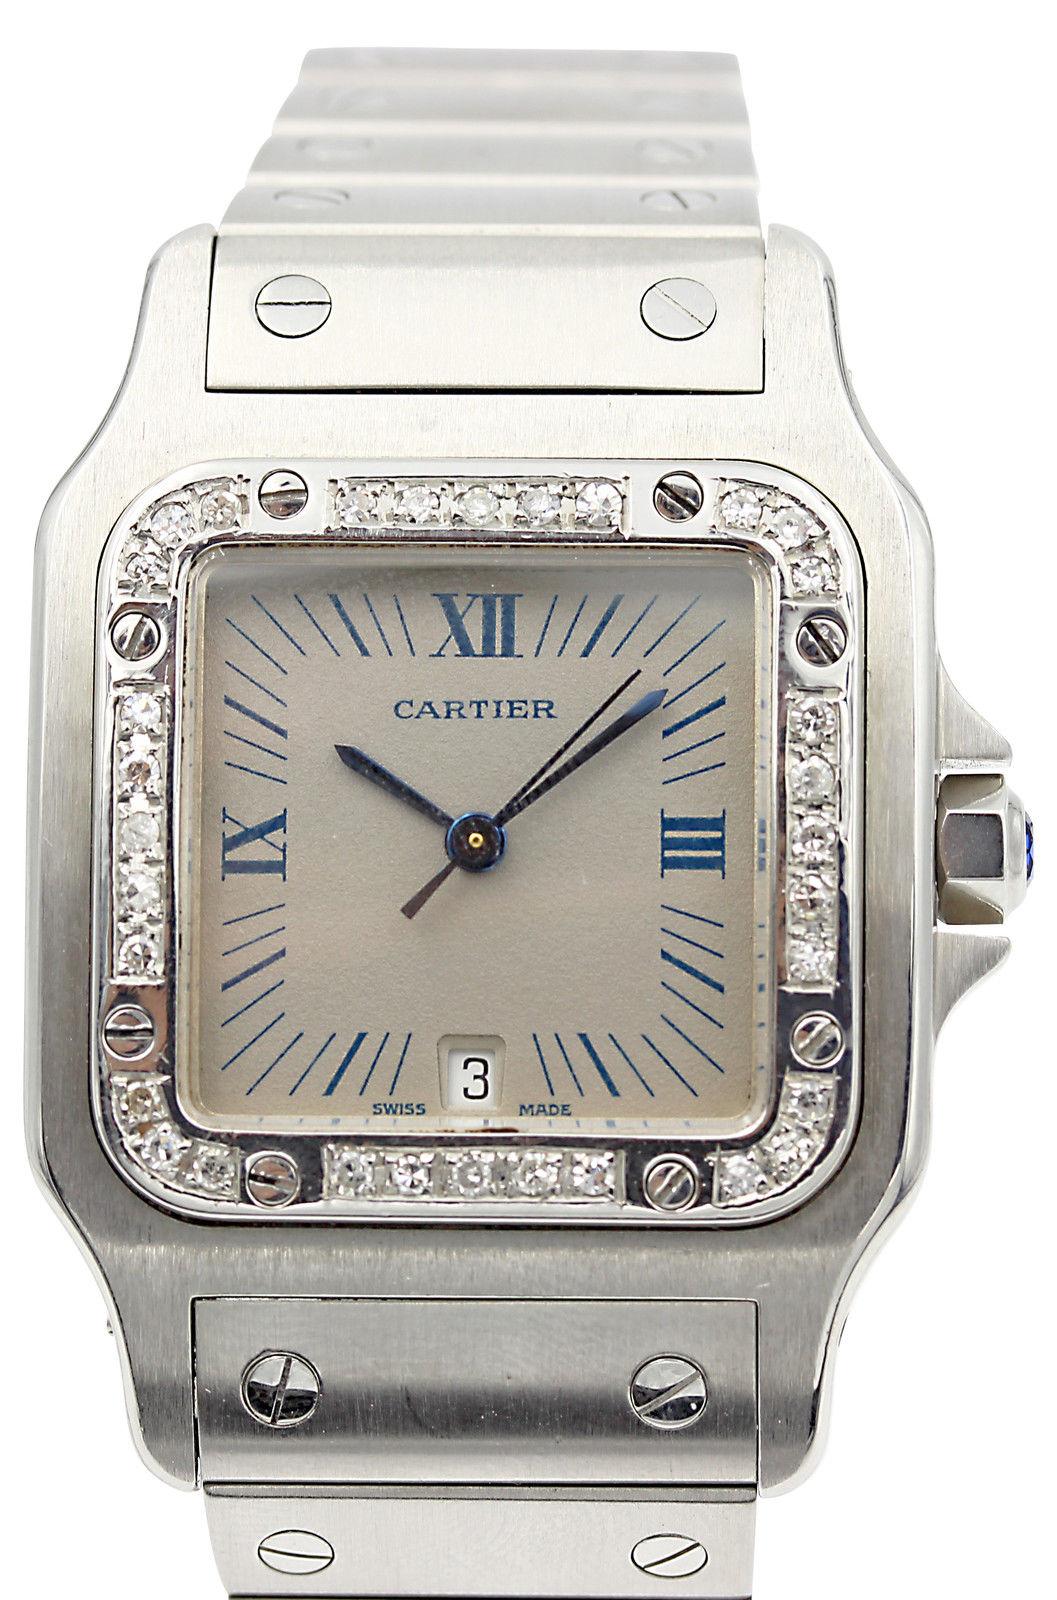 """""Cartier Santos Stainless Steel Unique Grey Dial & Diamonds Men's Watch"""""" 510631"